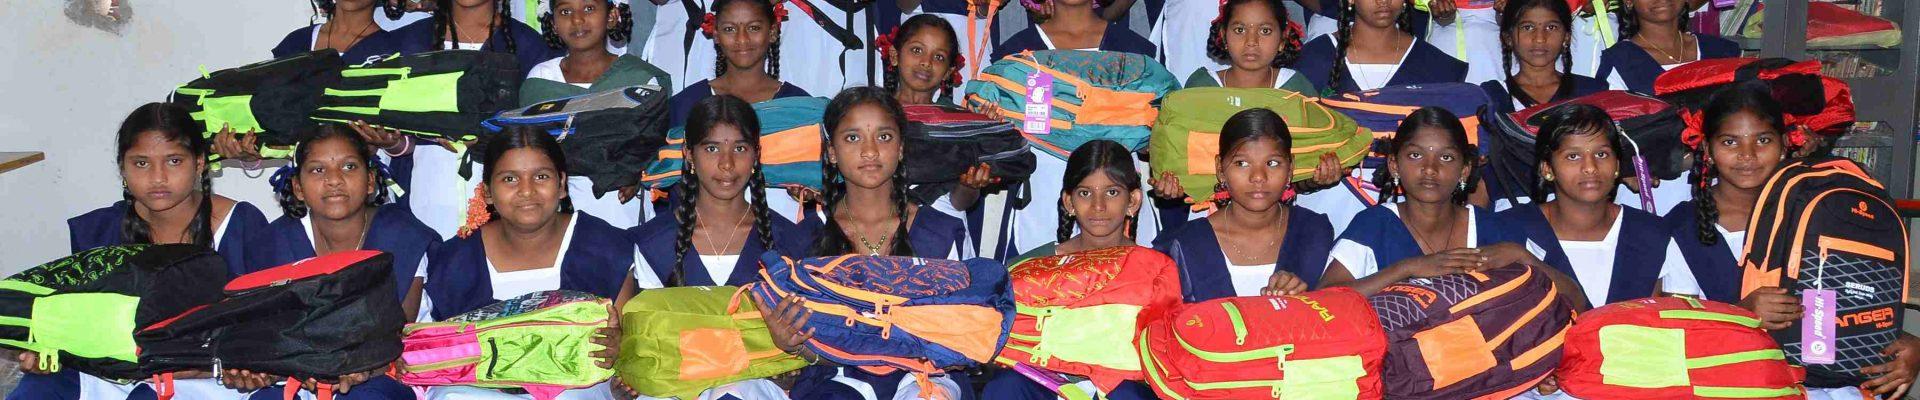 Pari School Bags Donation